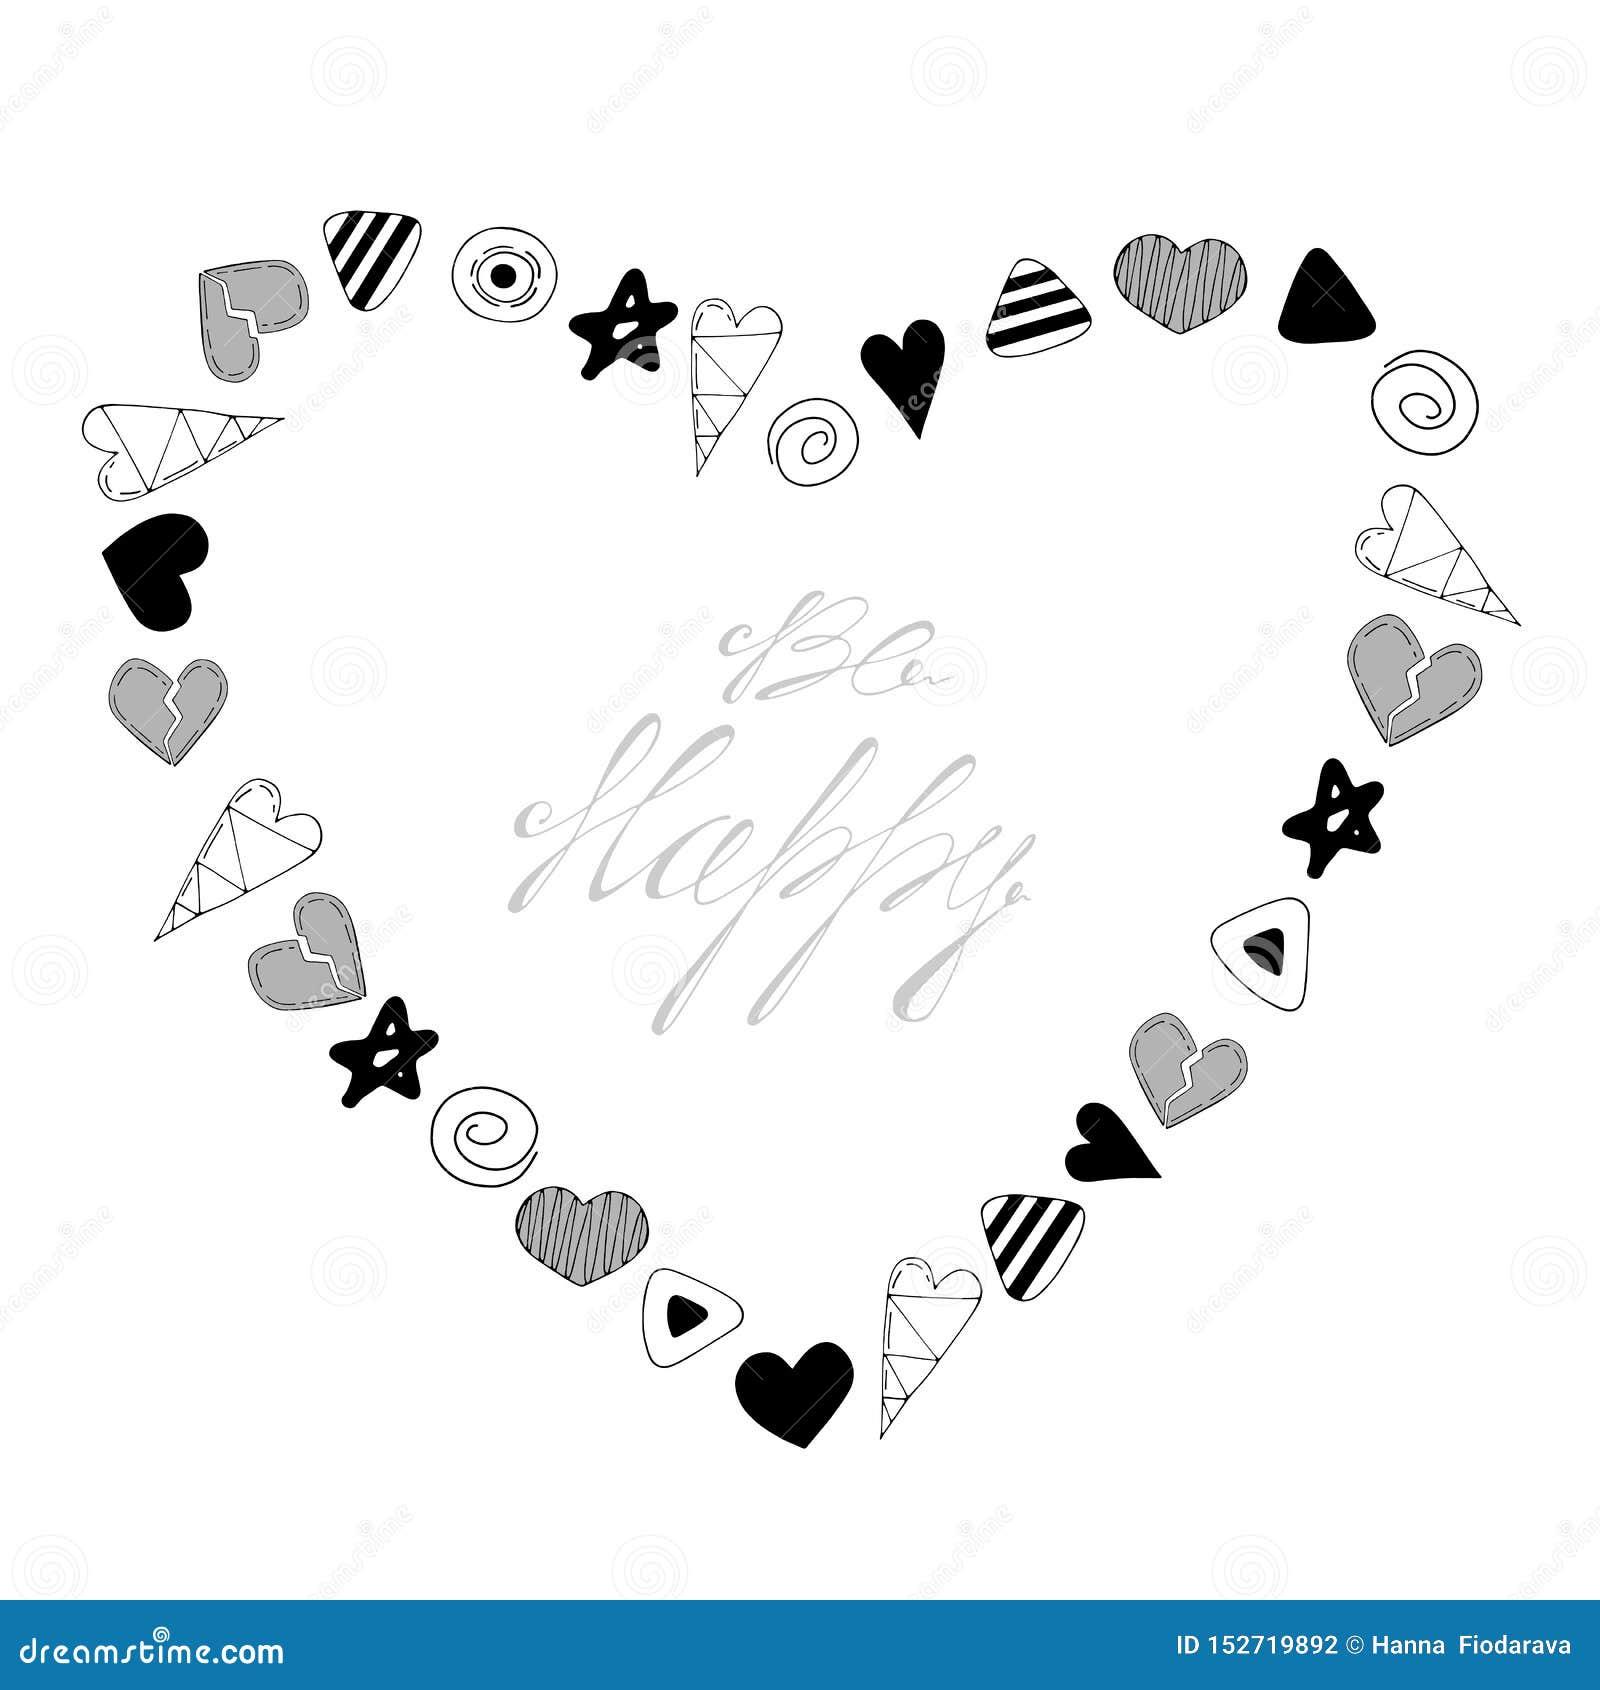 Be happy. Heart shaped frame vector illustration.